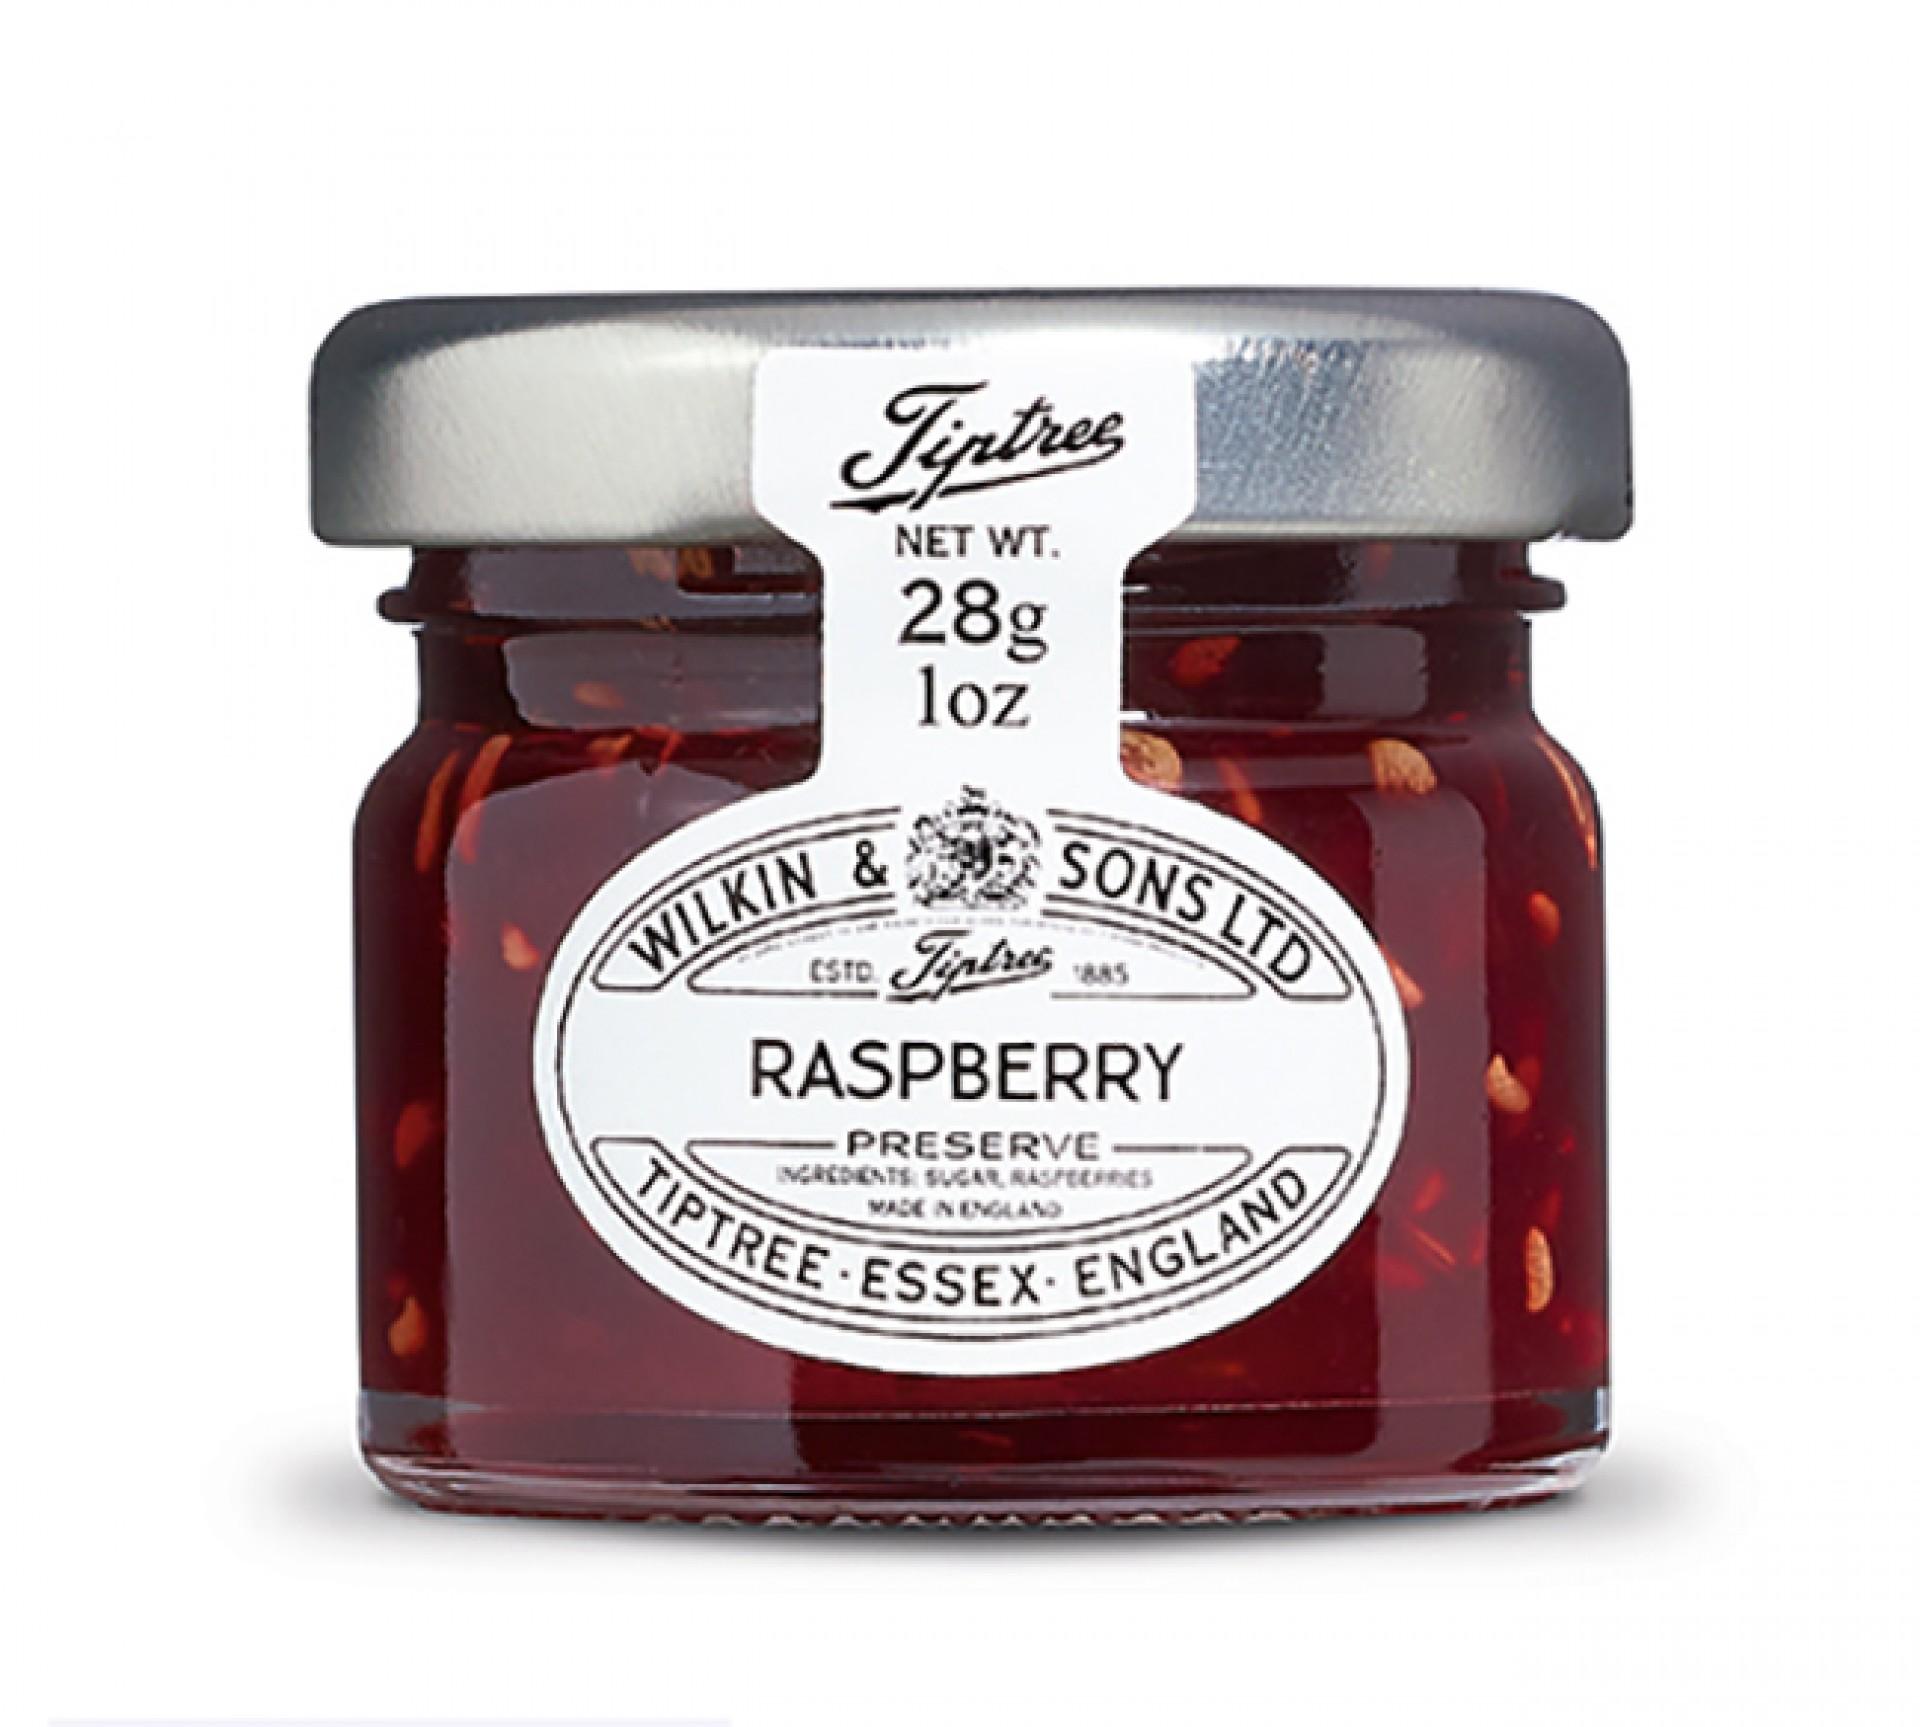 Tiptree Raspberry Preserve